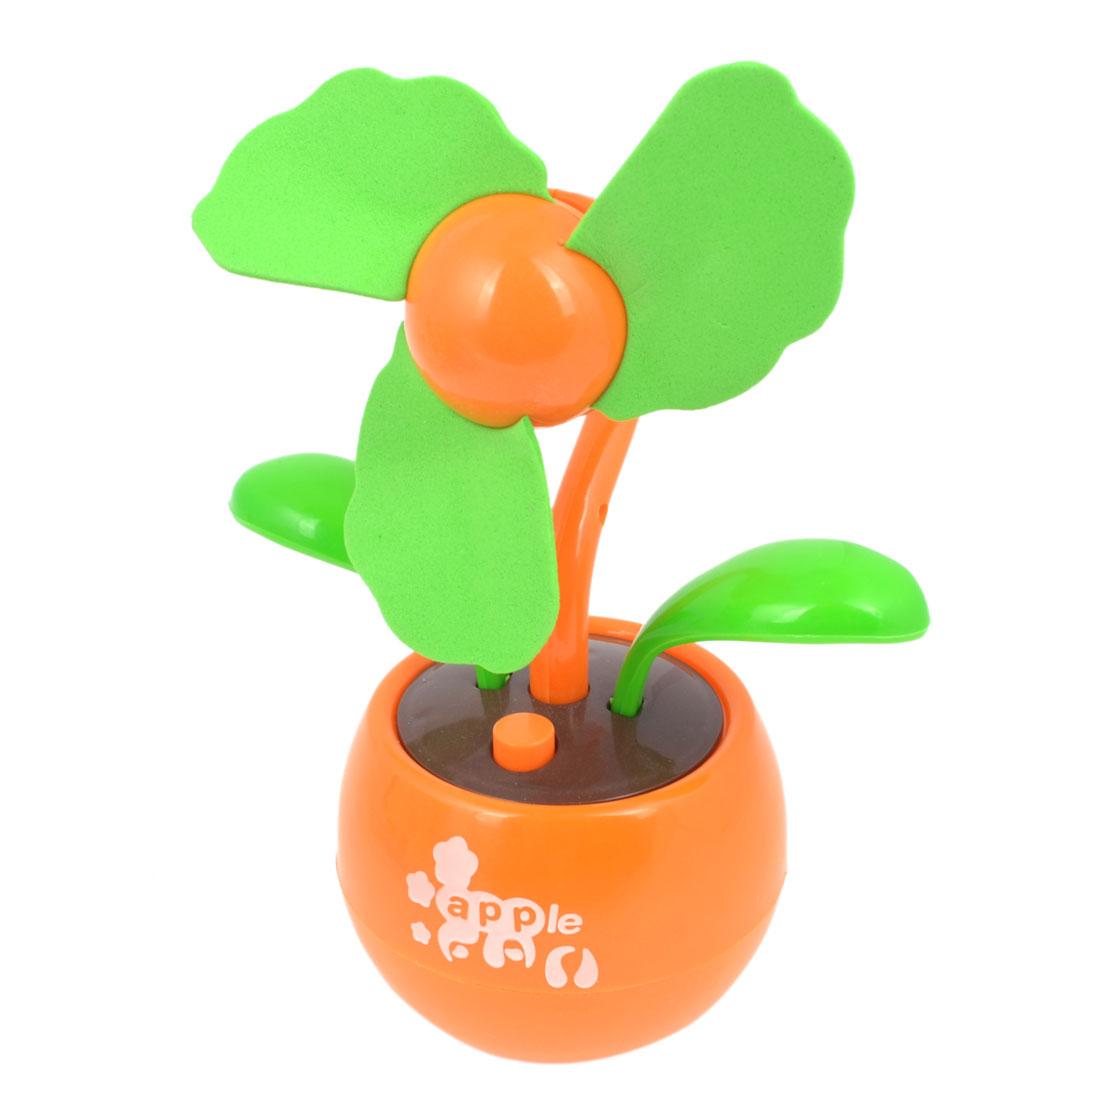 Floral Shape Green Foam Flabellum Apple Design Base USB Mini Fan